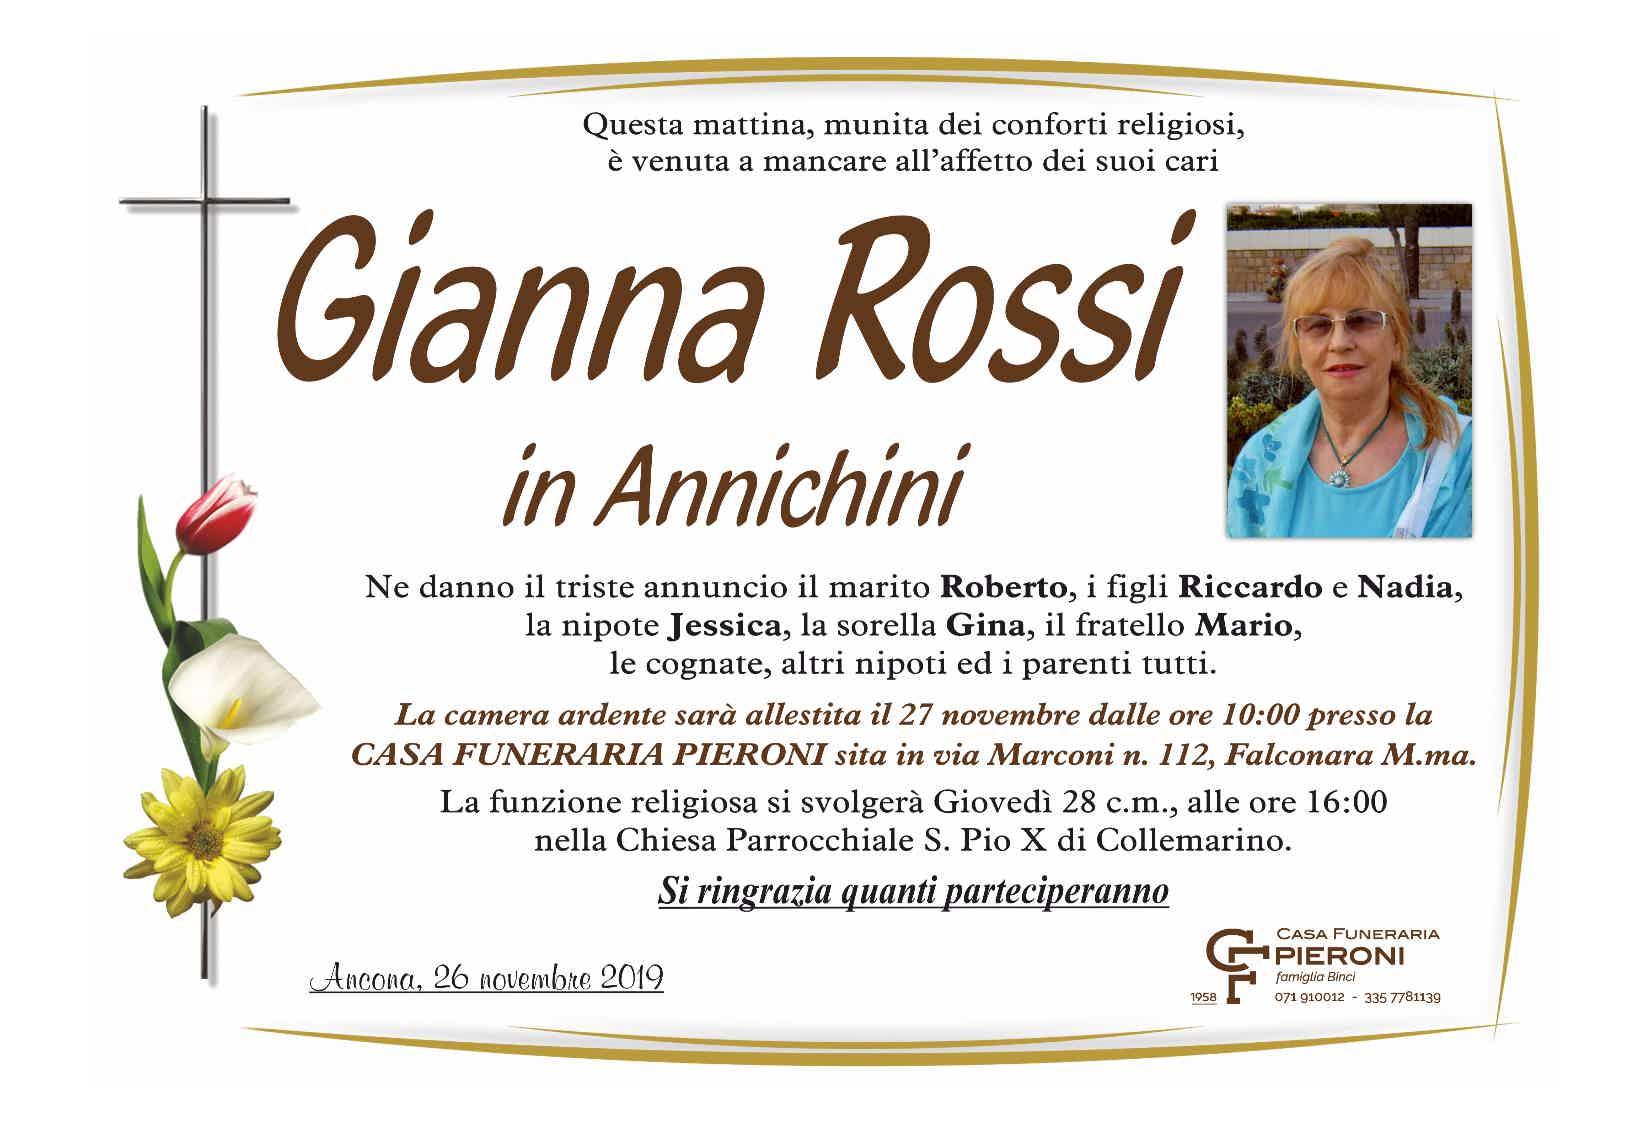 Gianna Rossi